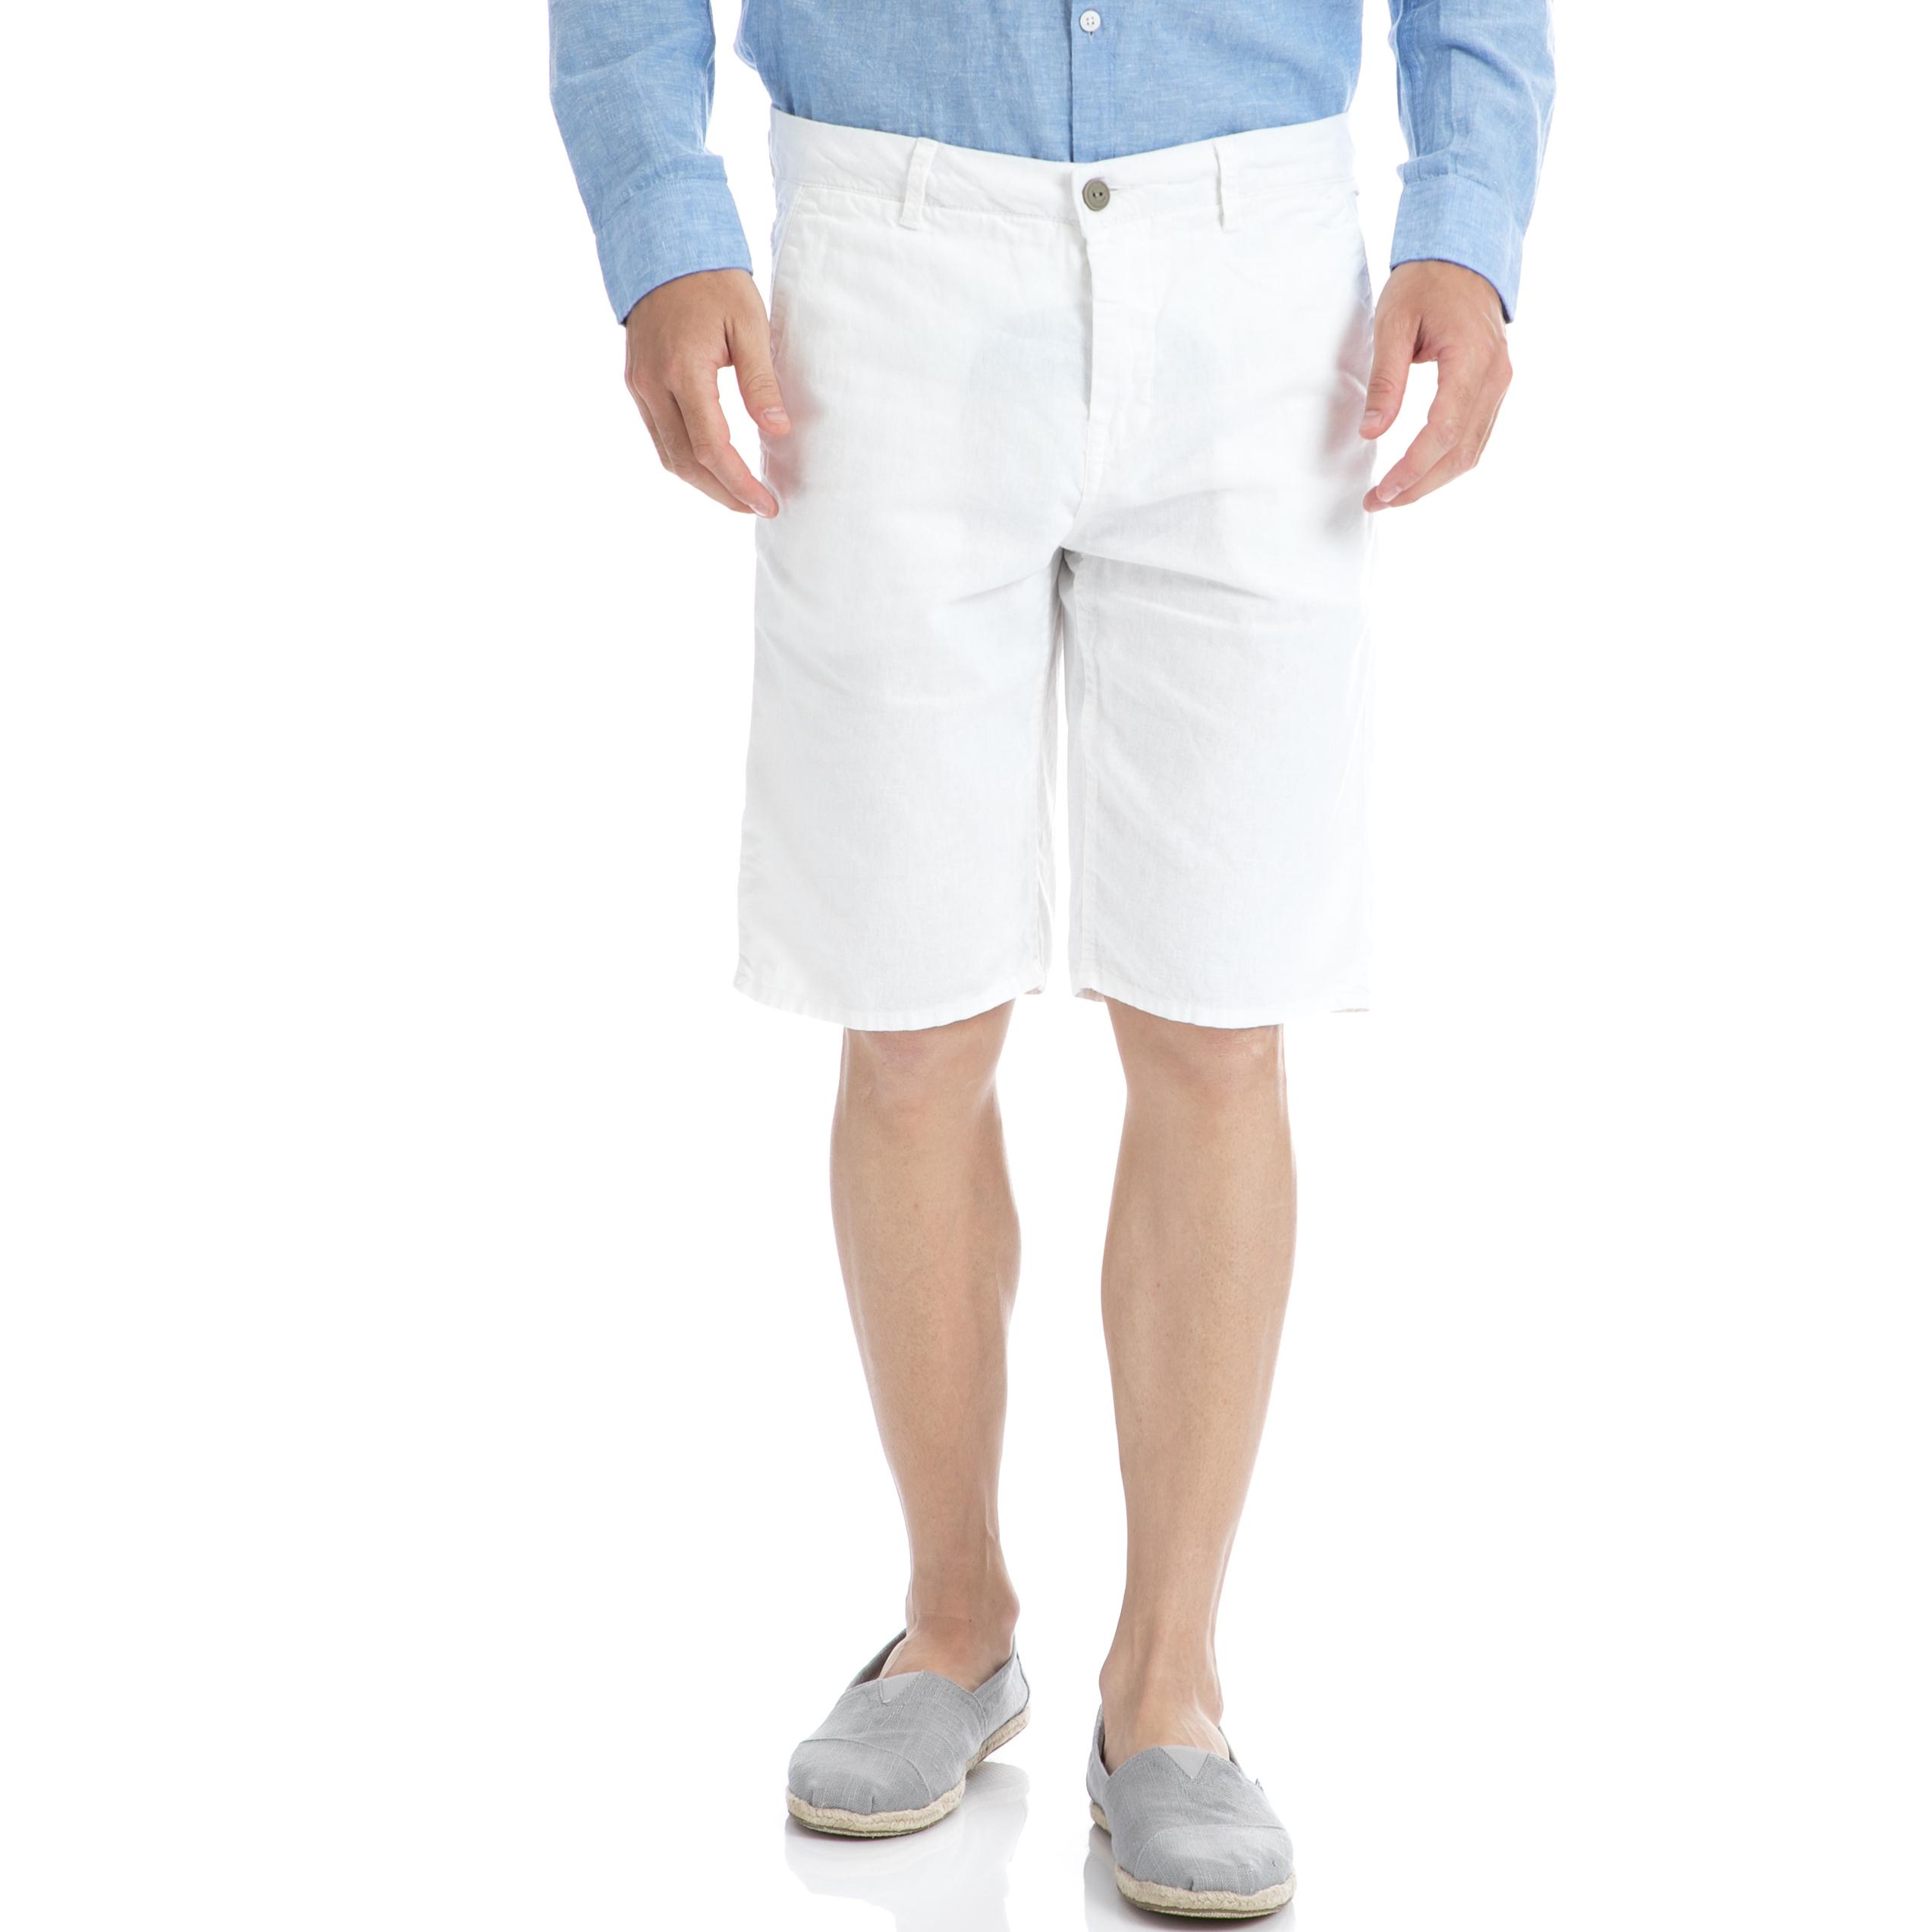 GARCIA JEANS - Αντρική βερμούδα Garcia Jeans άσπρη ανδρικά ρούχα σορτς βερμούδες casual jean